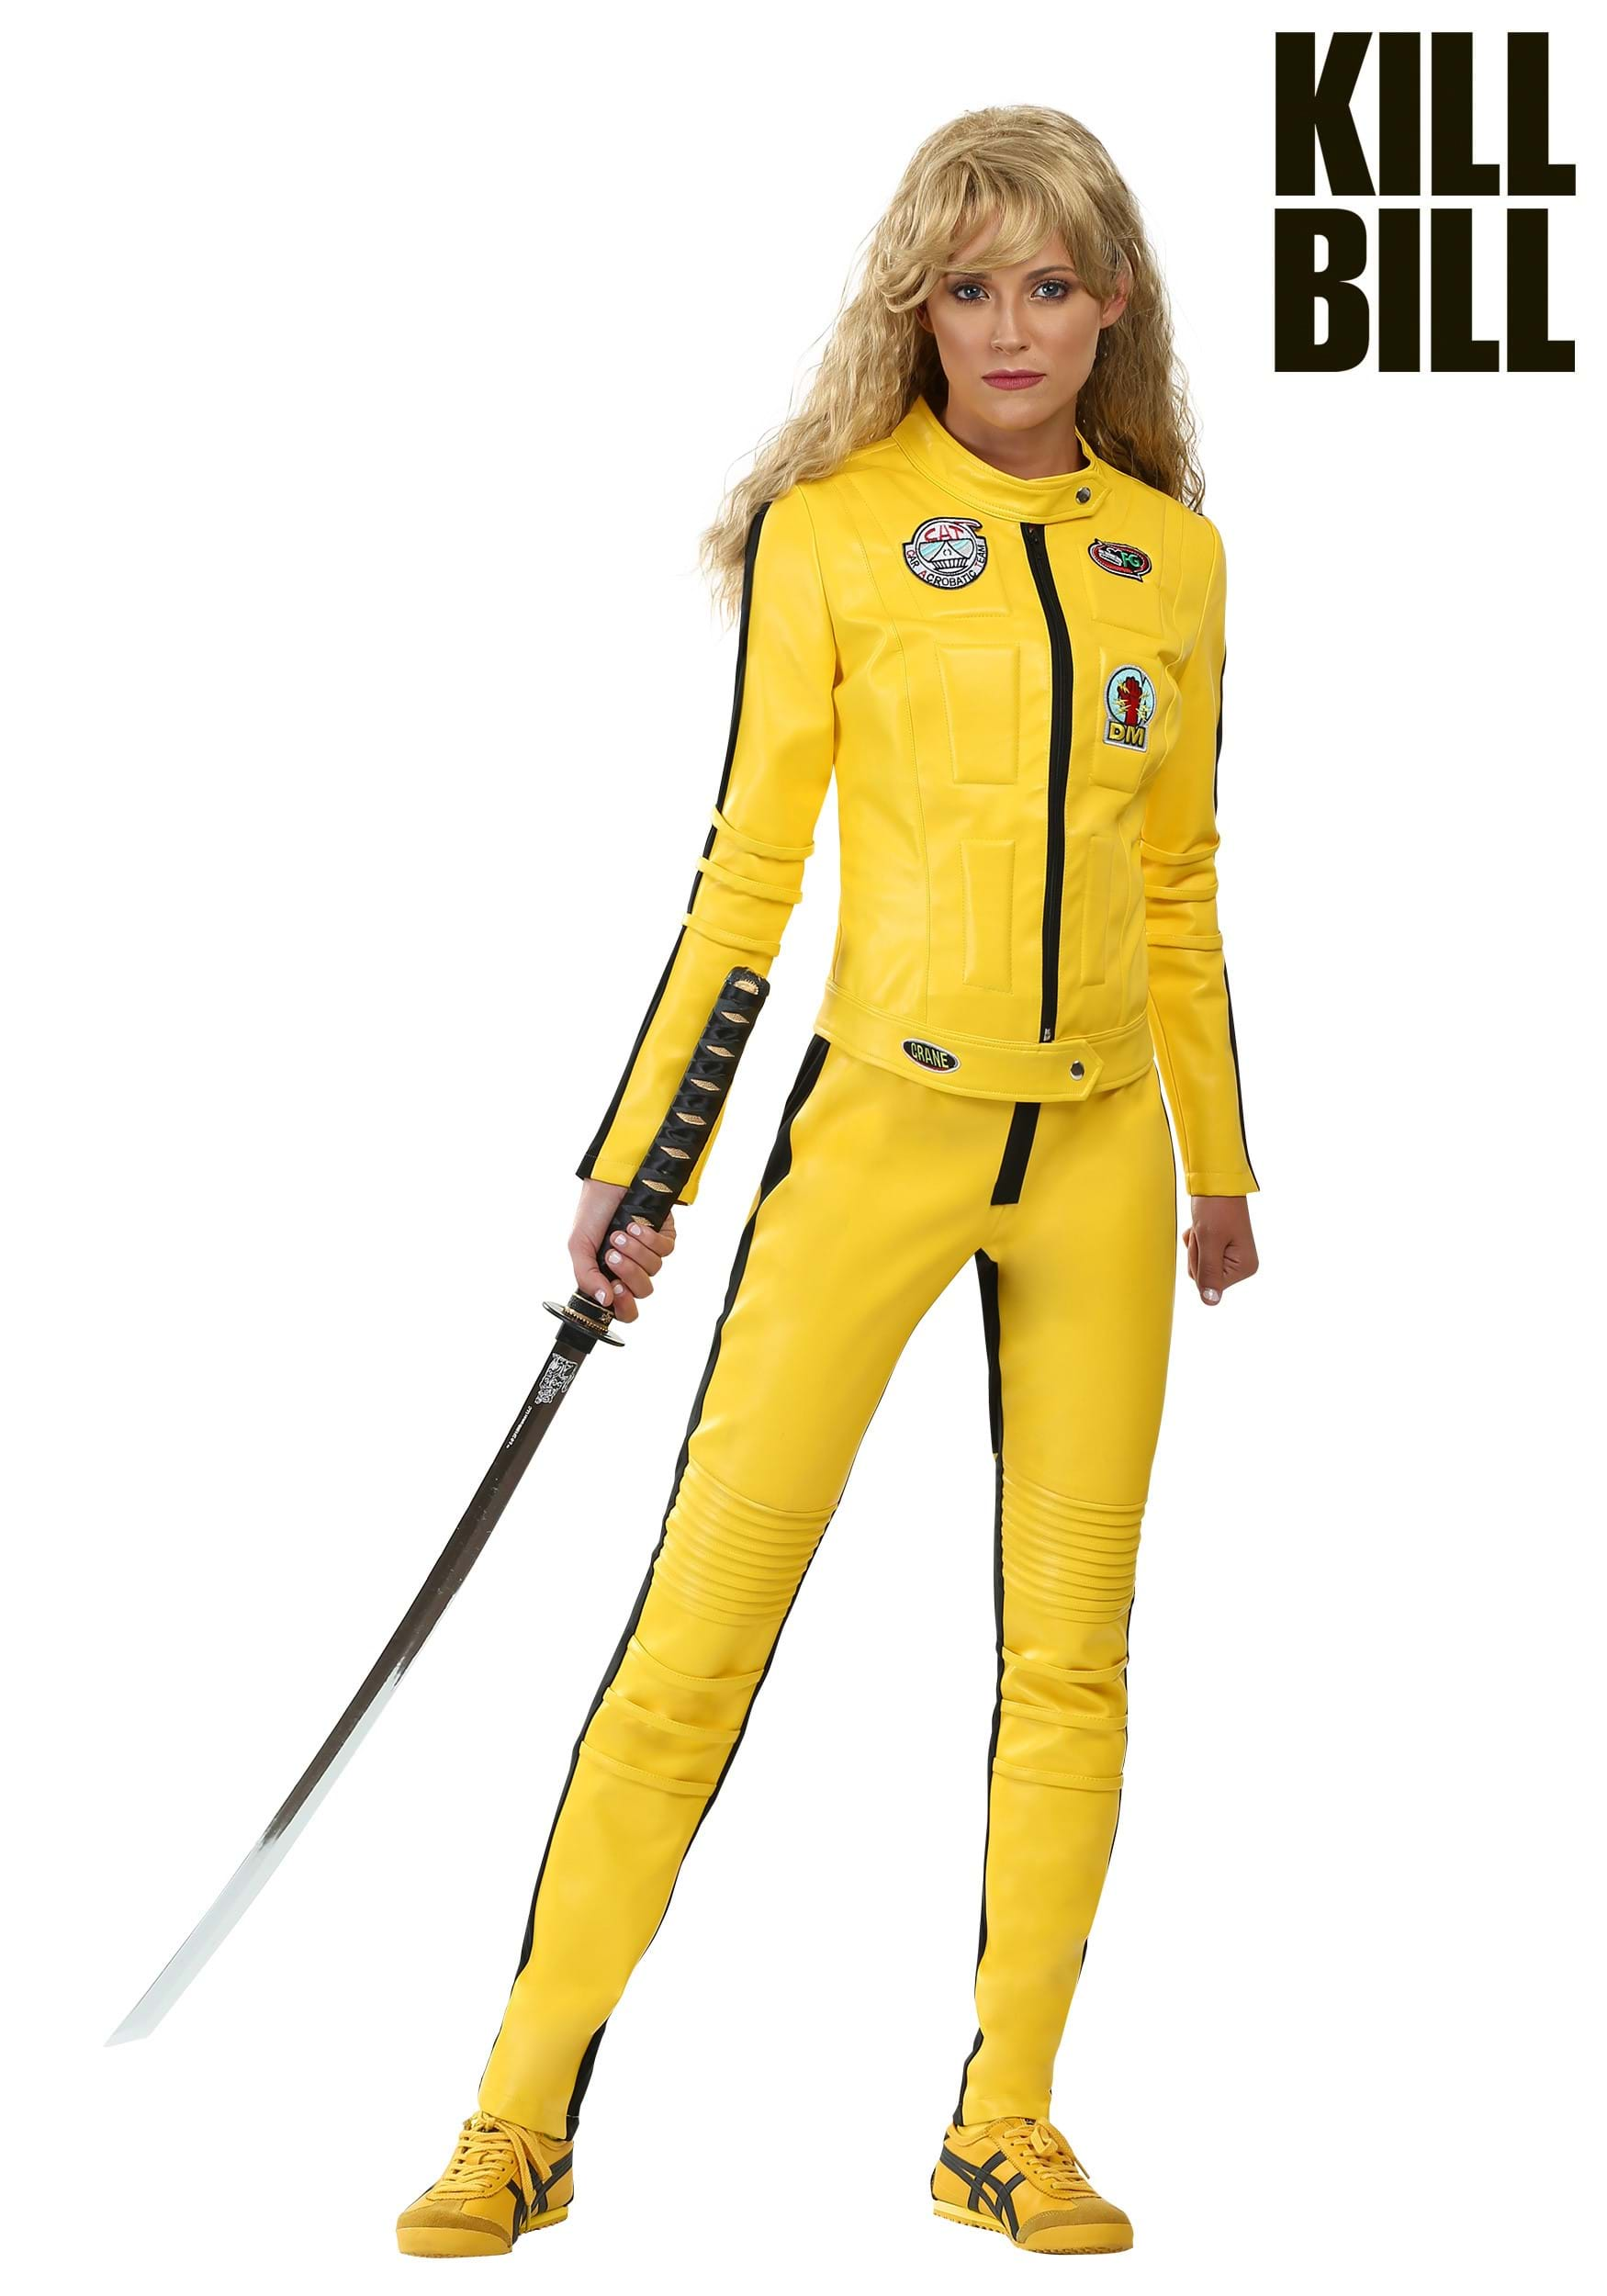 Kill Bill Beatrix Kiddo Motorcycle Suit FUN0206AD